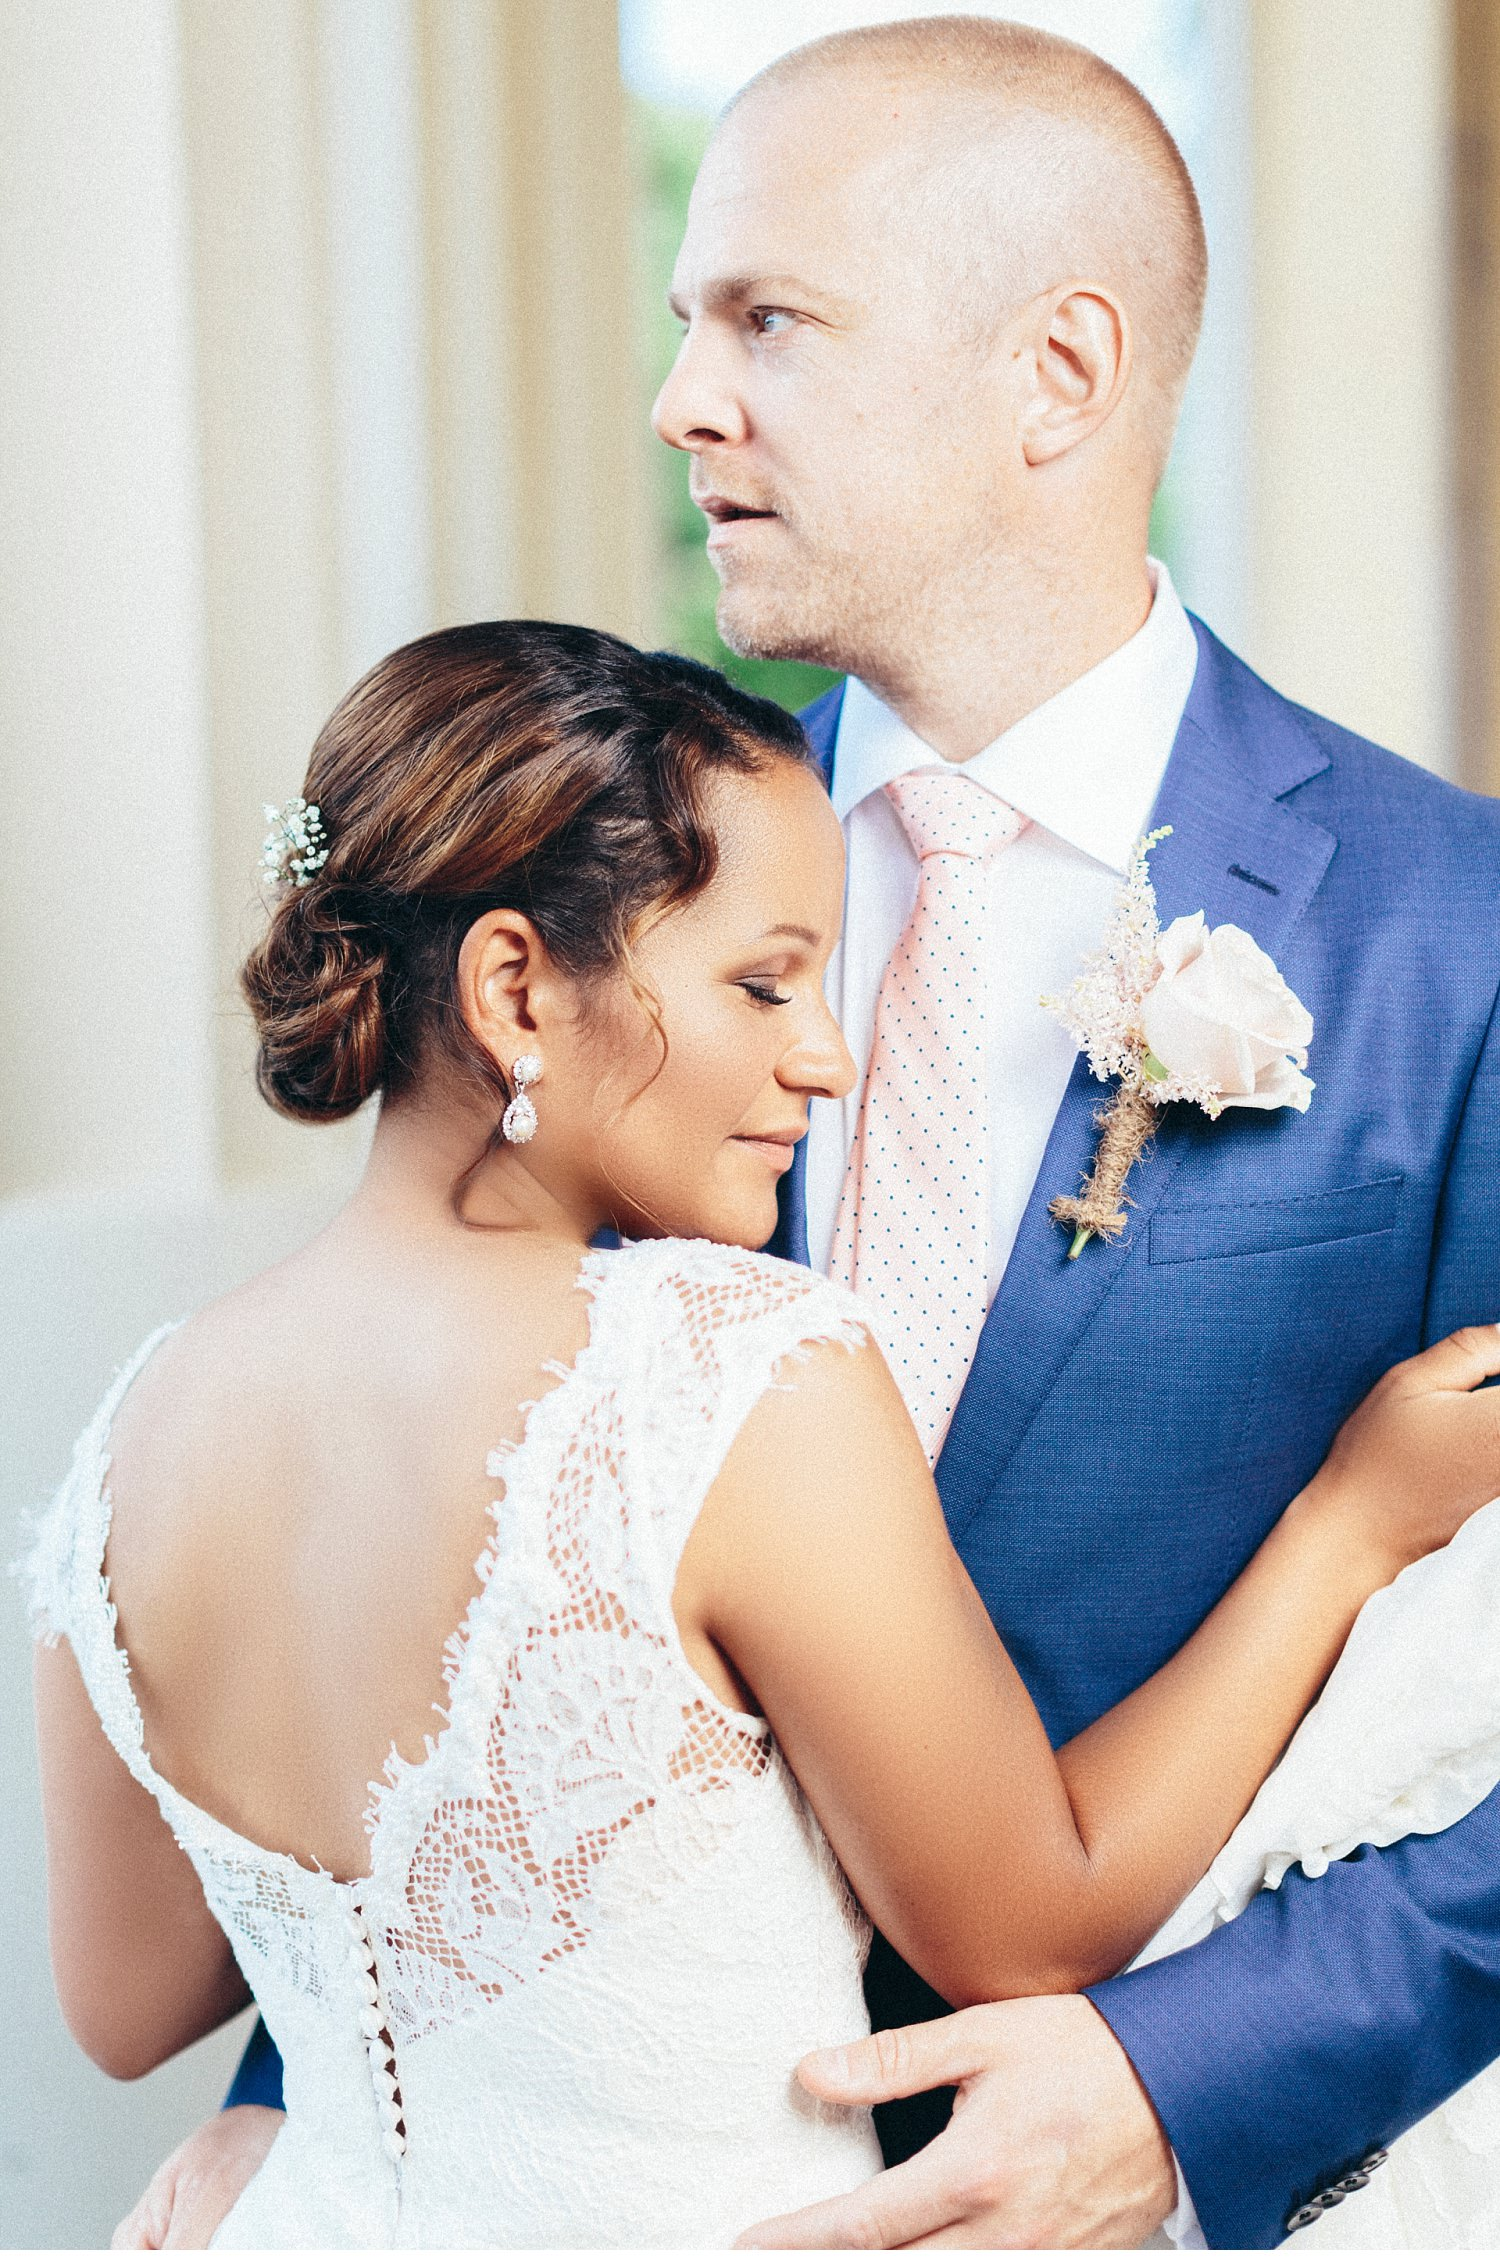 linnea johan 261 - Linnea & Johan Hedberg's Wedding wedding